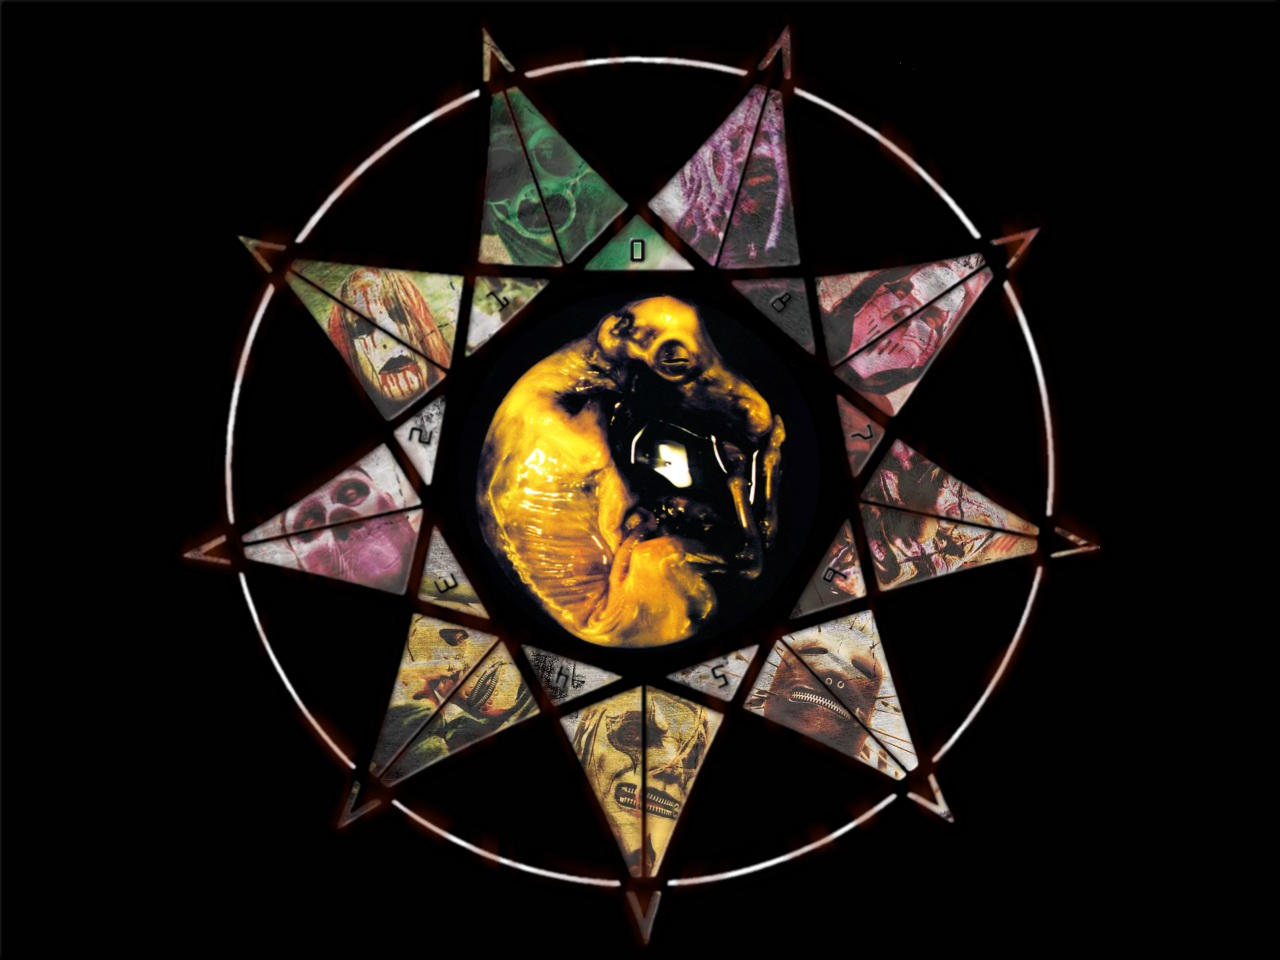 The Final Abortion by MidnightExigent